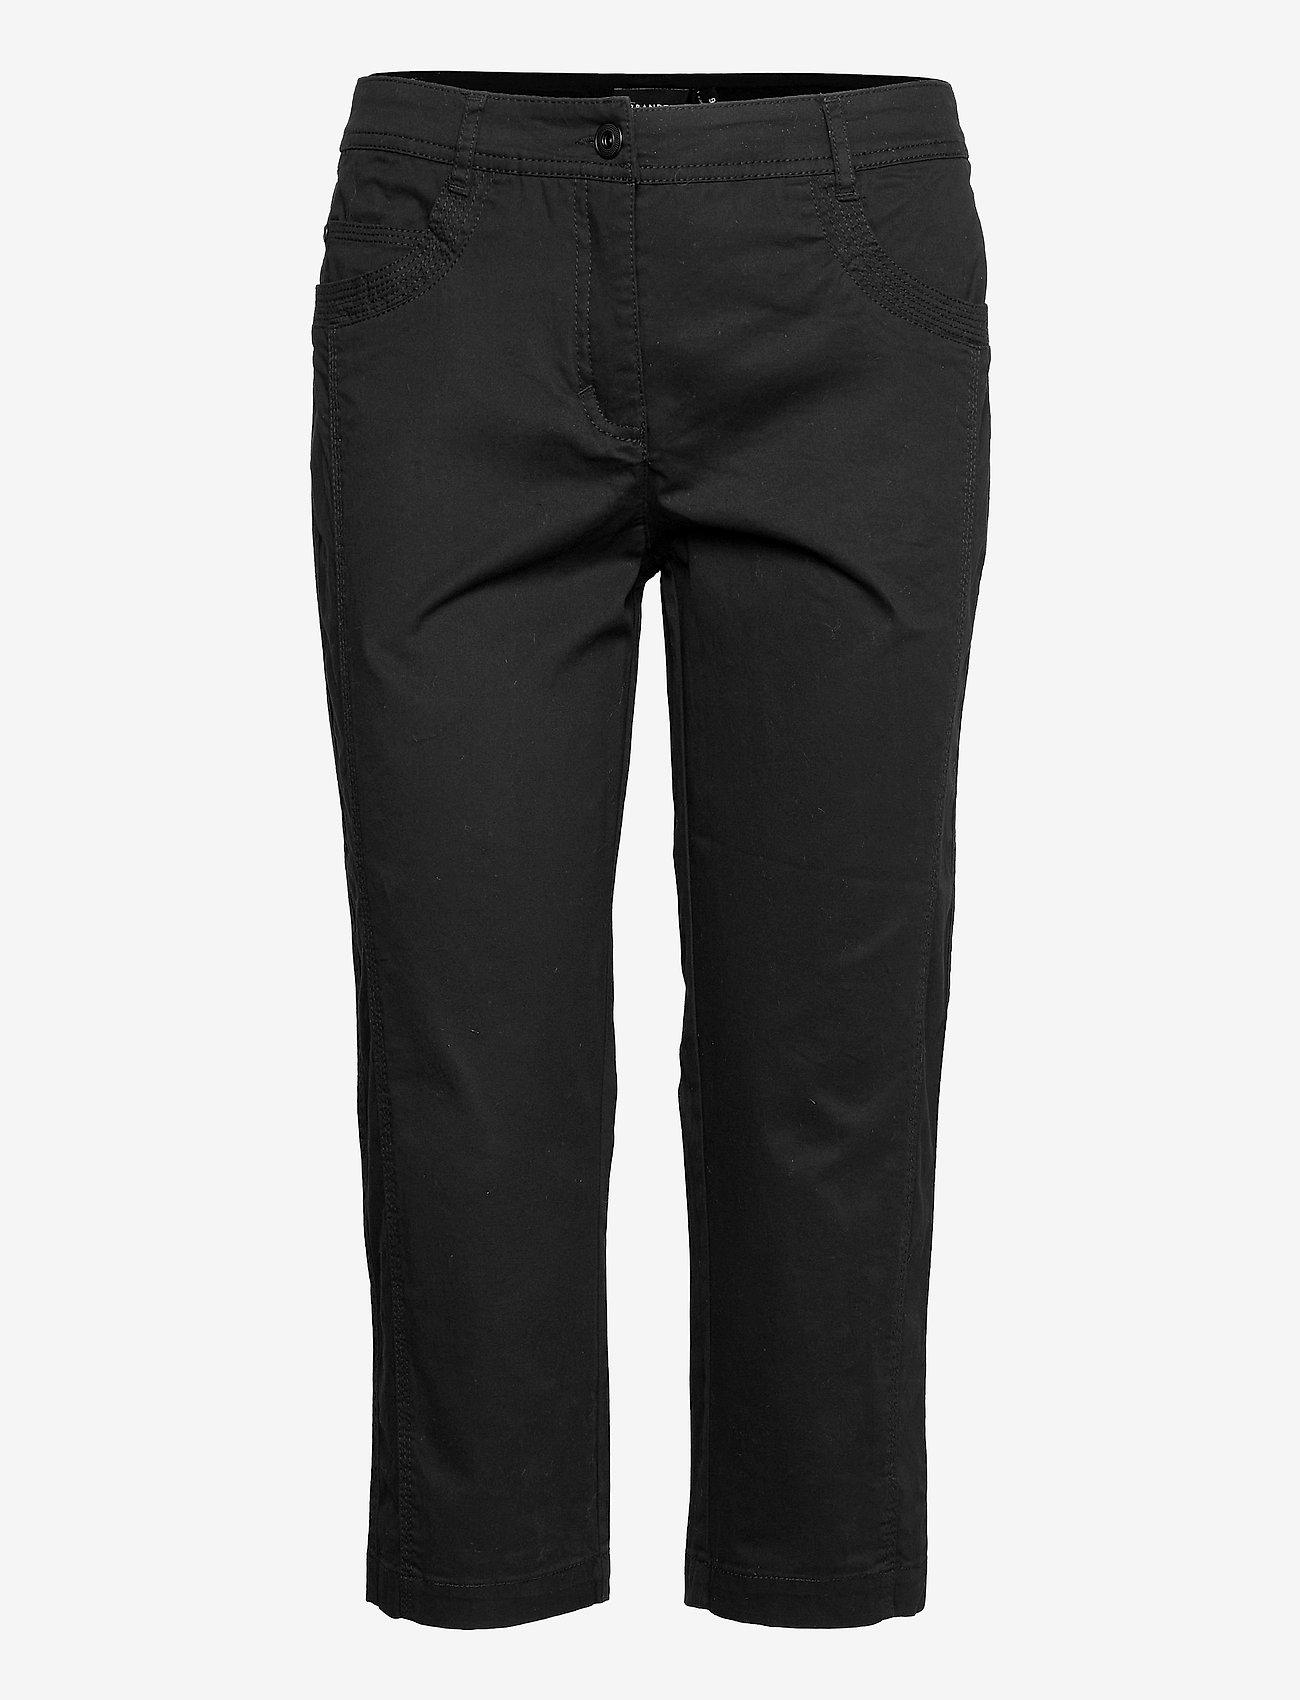 Brandtex - Capri pants - pantalons capri - black - 0